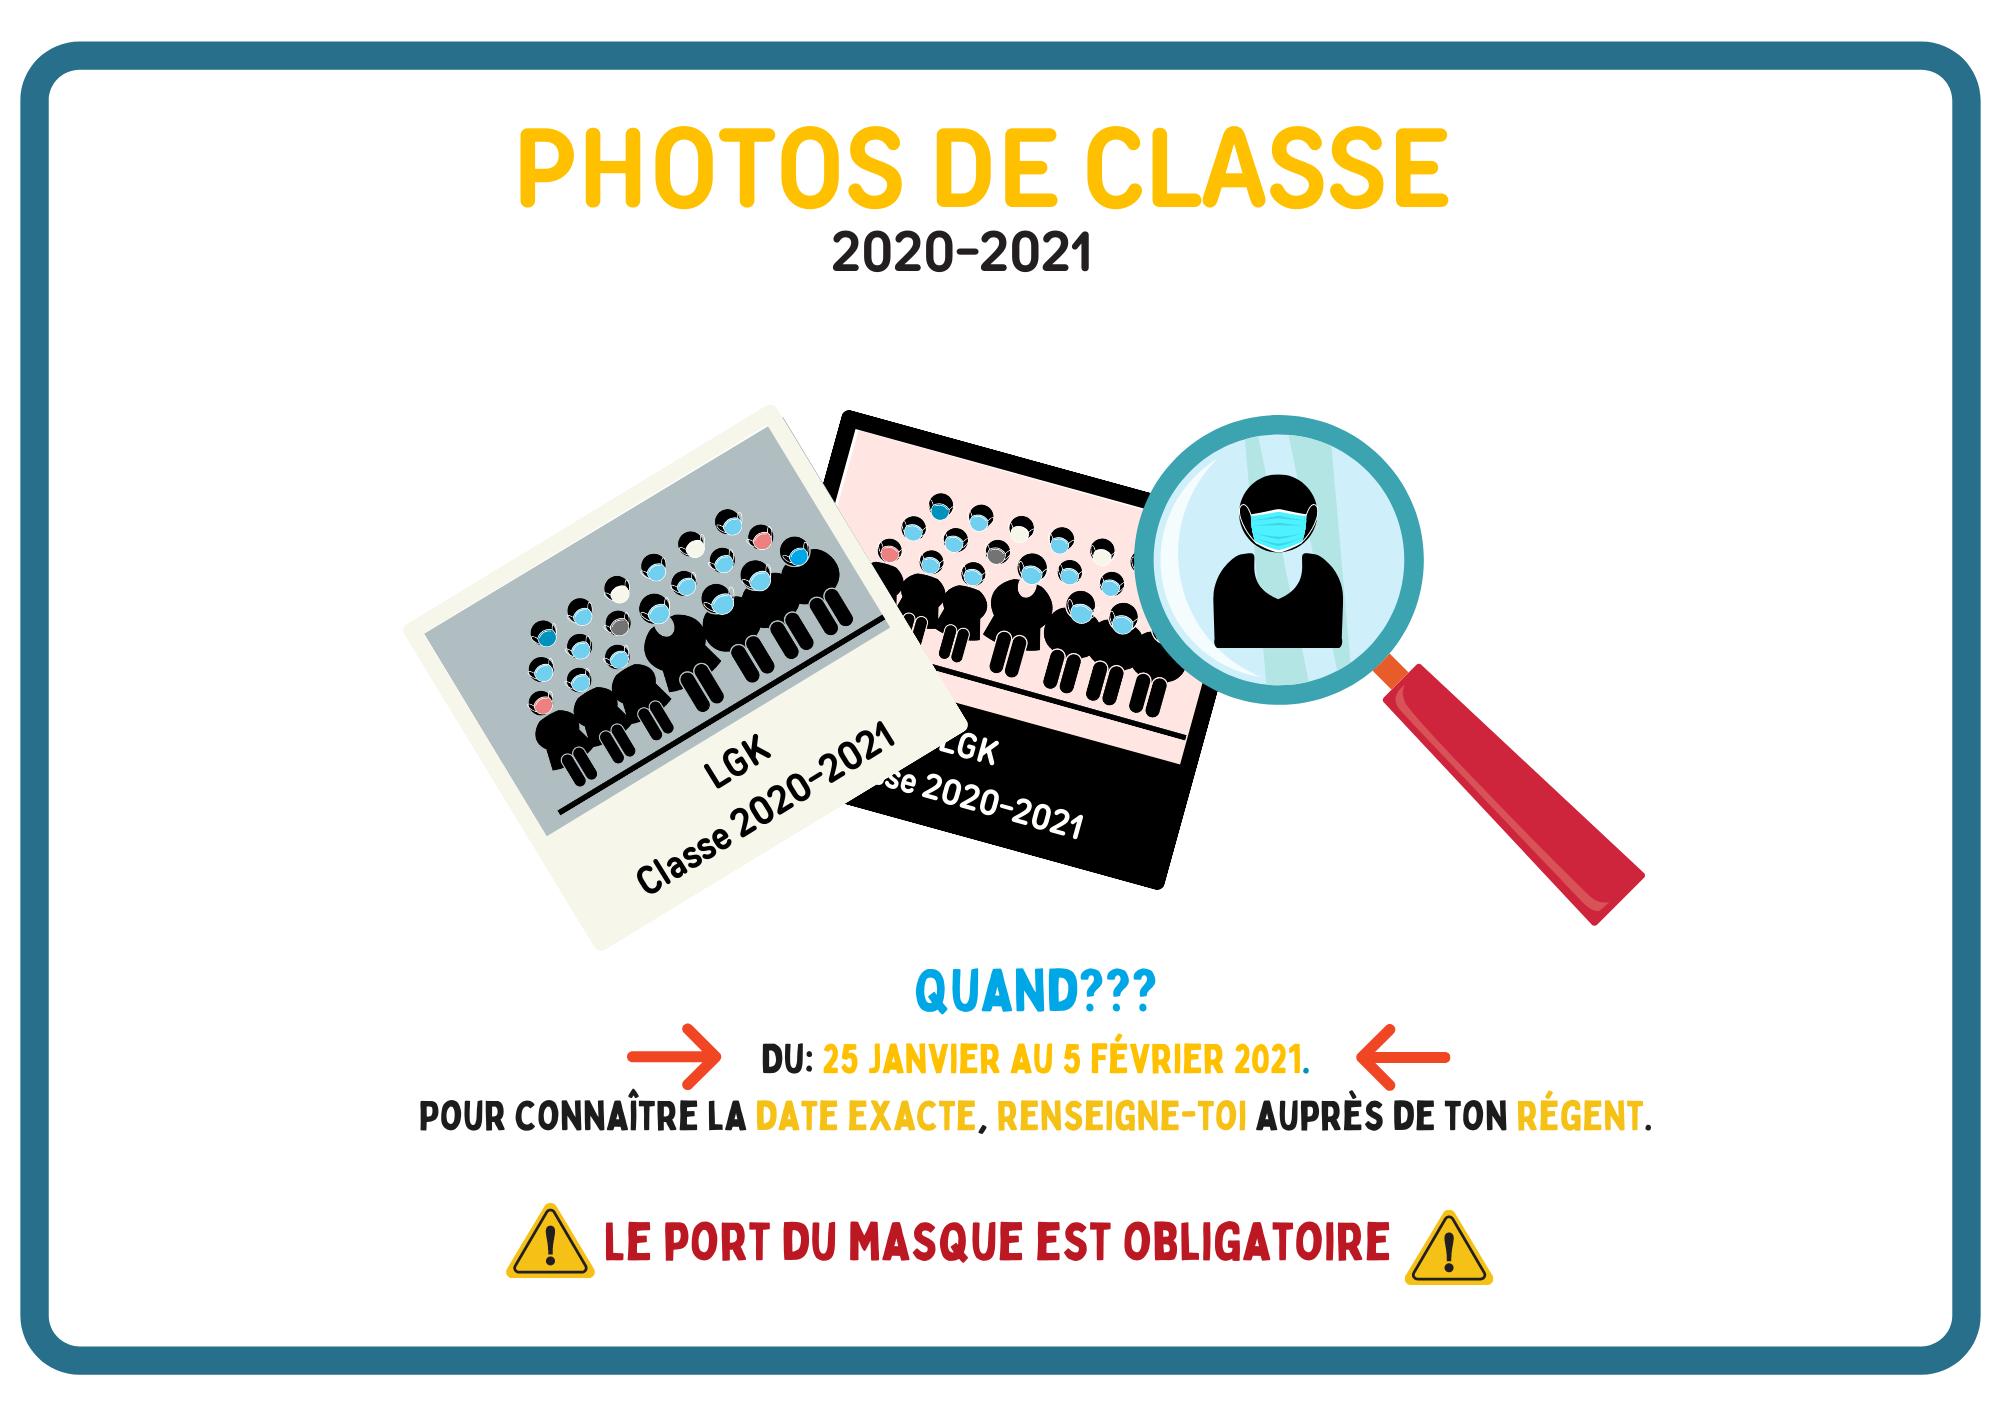 Photos de classe (2020-2021)